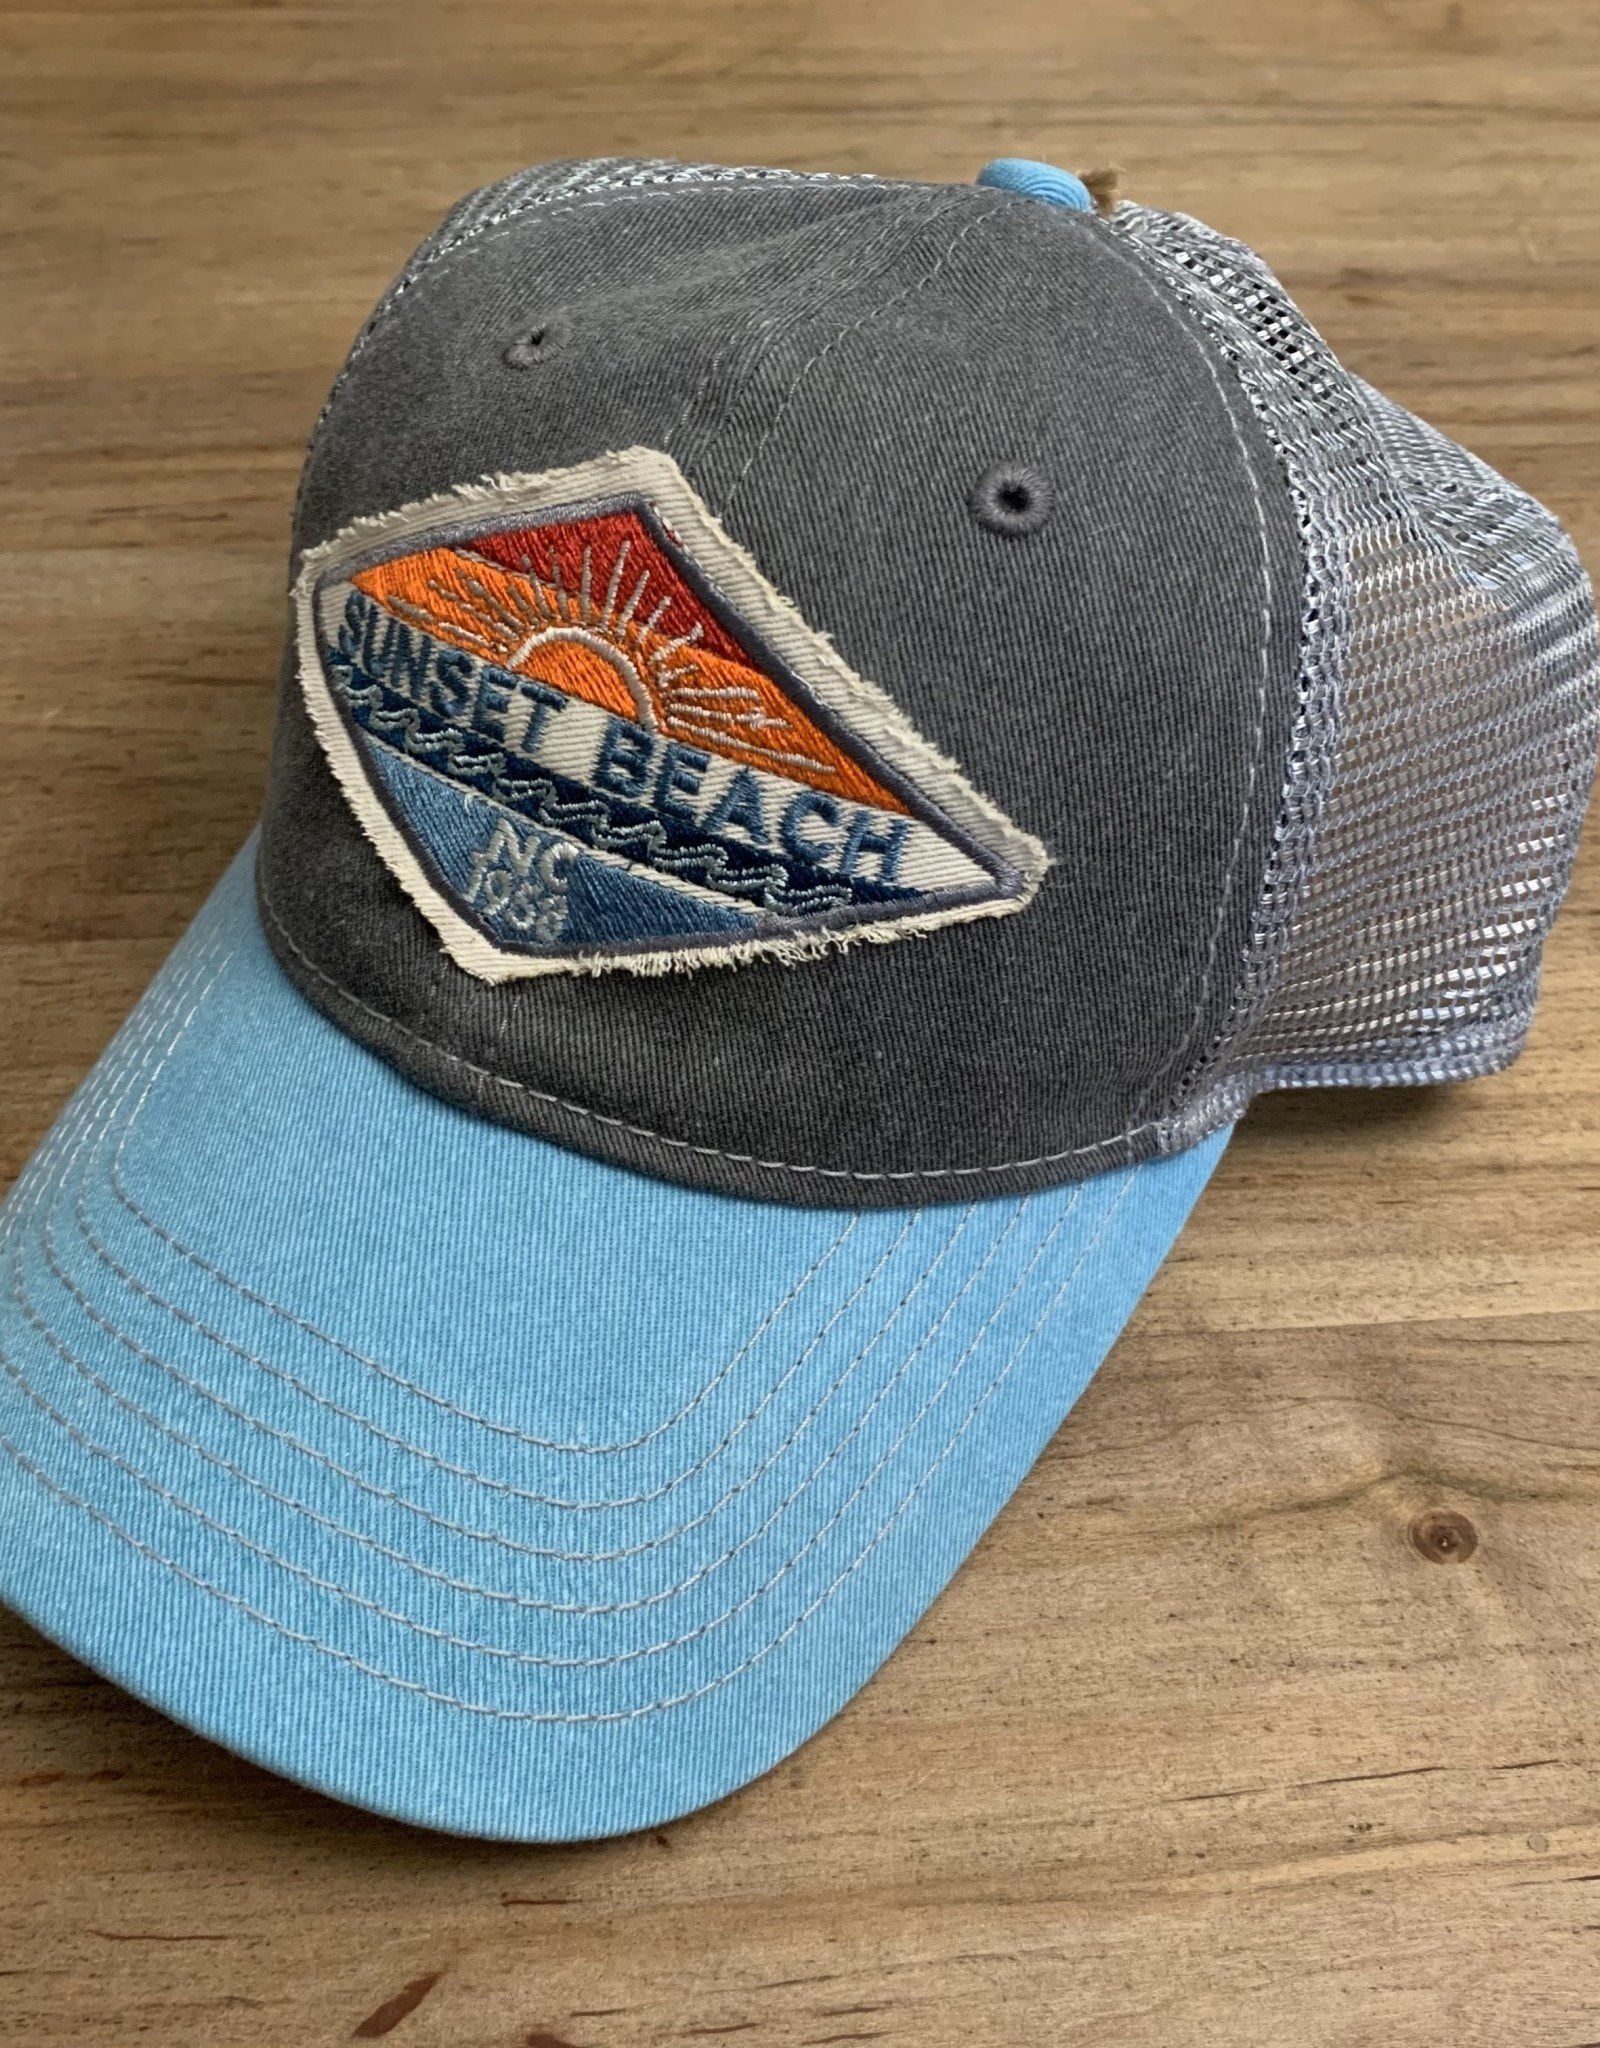 HALLENA SUN WAVE SCOUT LOWPRO TRUCKER CAP